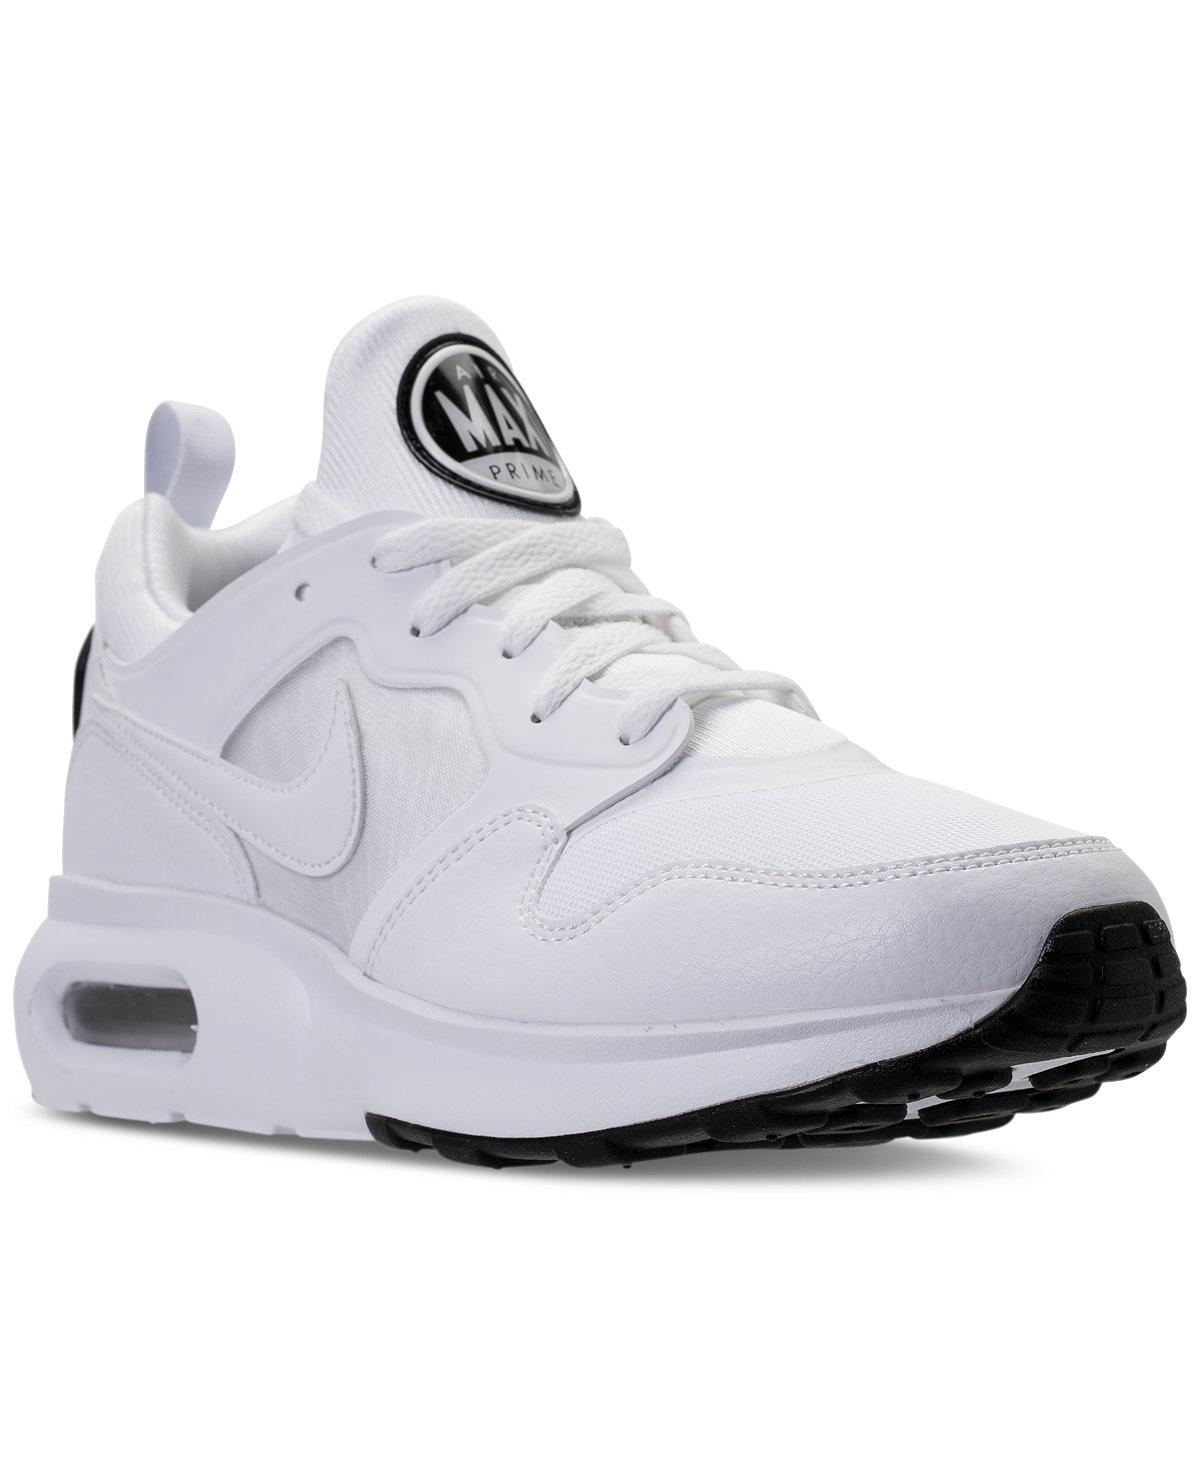 5621aca88 Prime Nike Max para de 98 hombre 44 Macys Air deporte 110 Zapatillas reg  6vvHUq